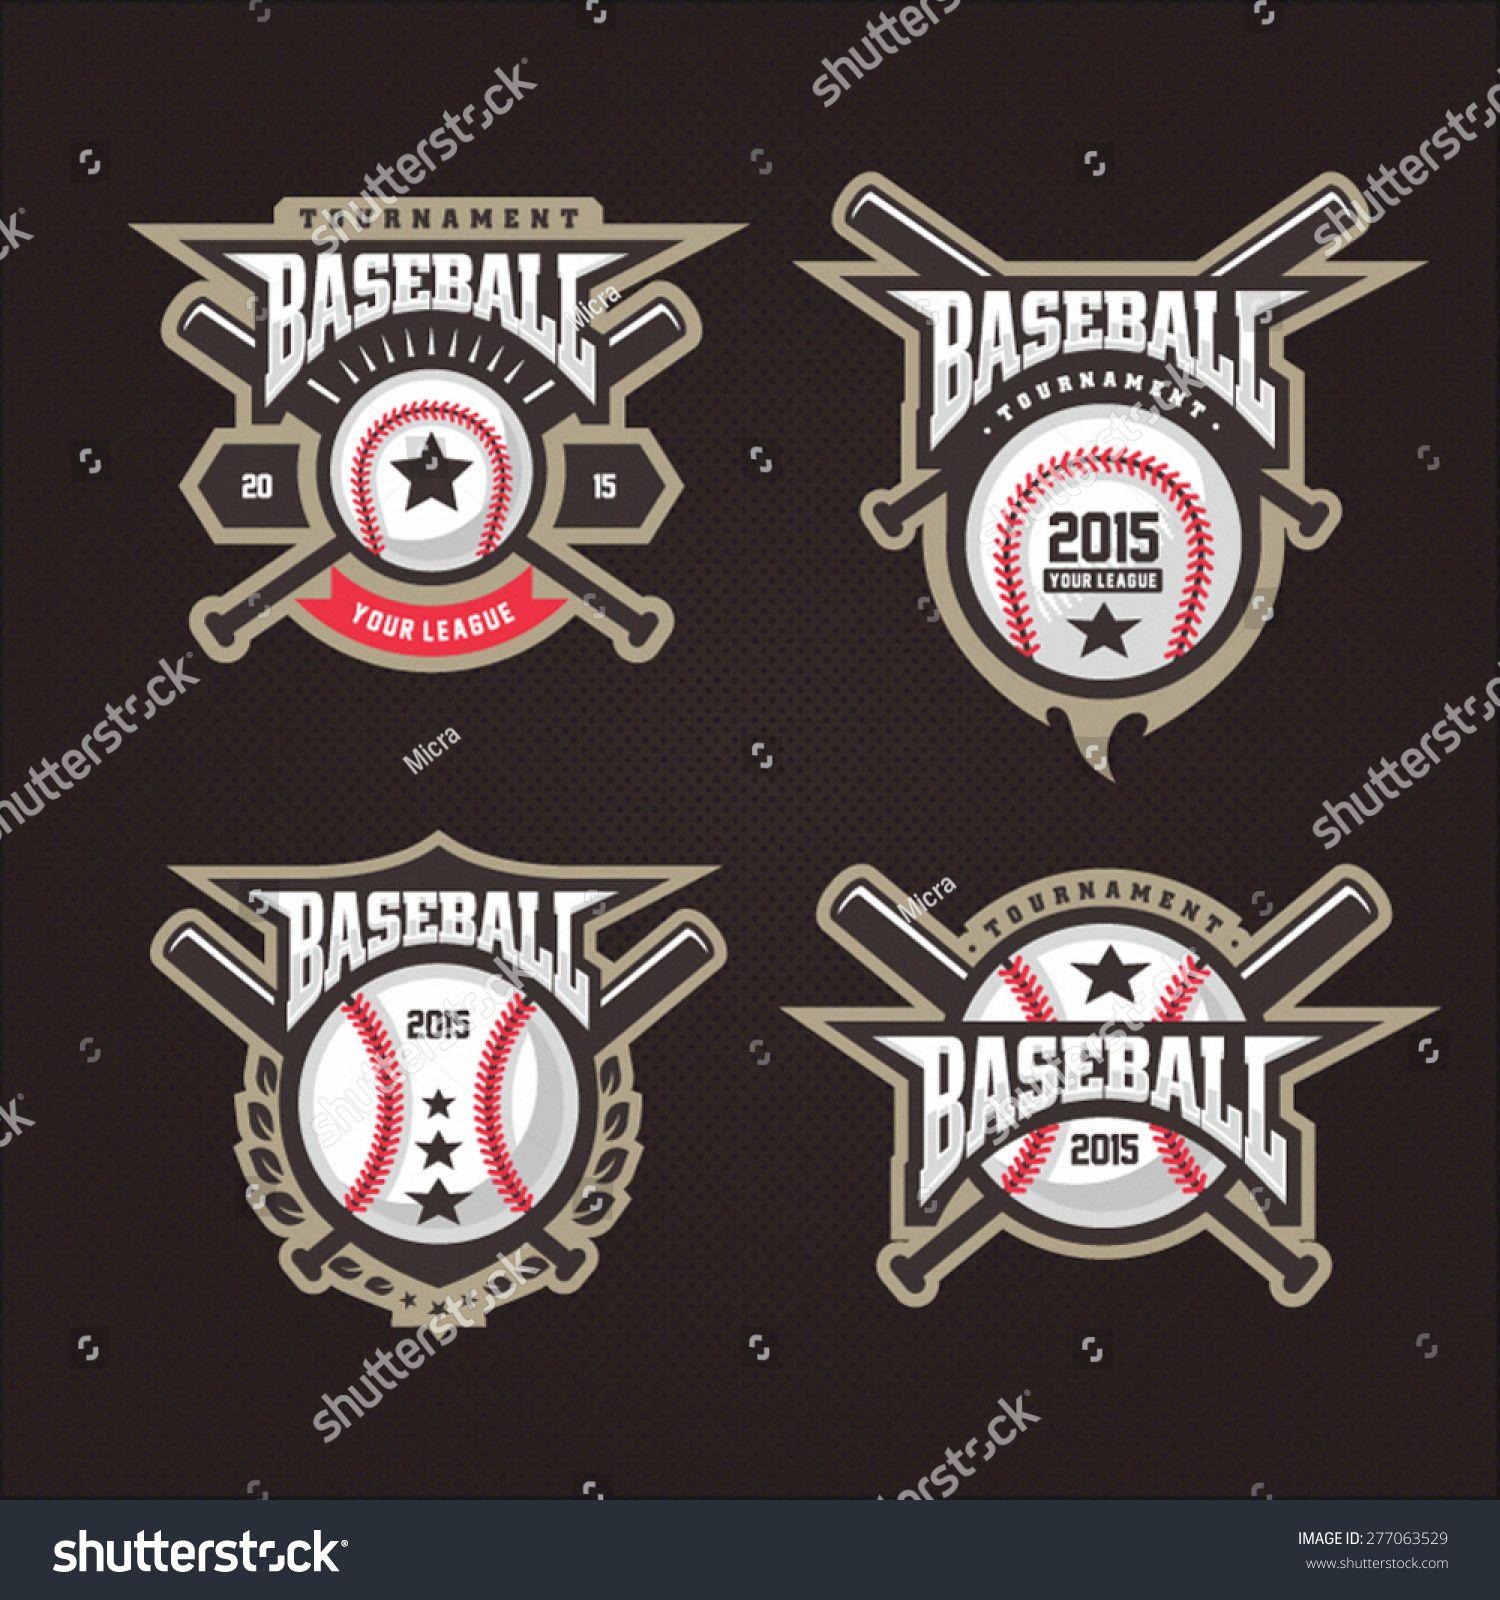 Baseball Tournament Professional Logo Ad Sponsored Tournament Baseball Logo Professional Baseball Tournament Professional Logo Graphic Design Logo